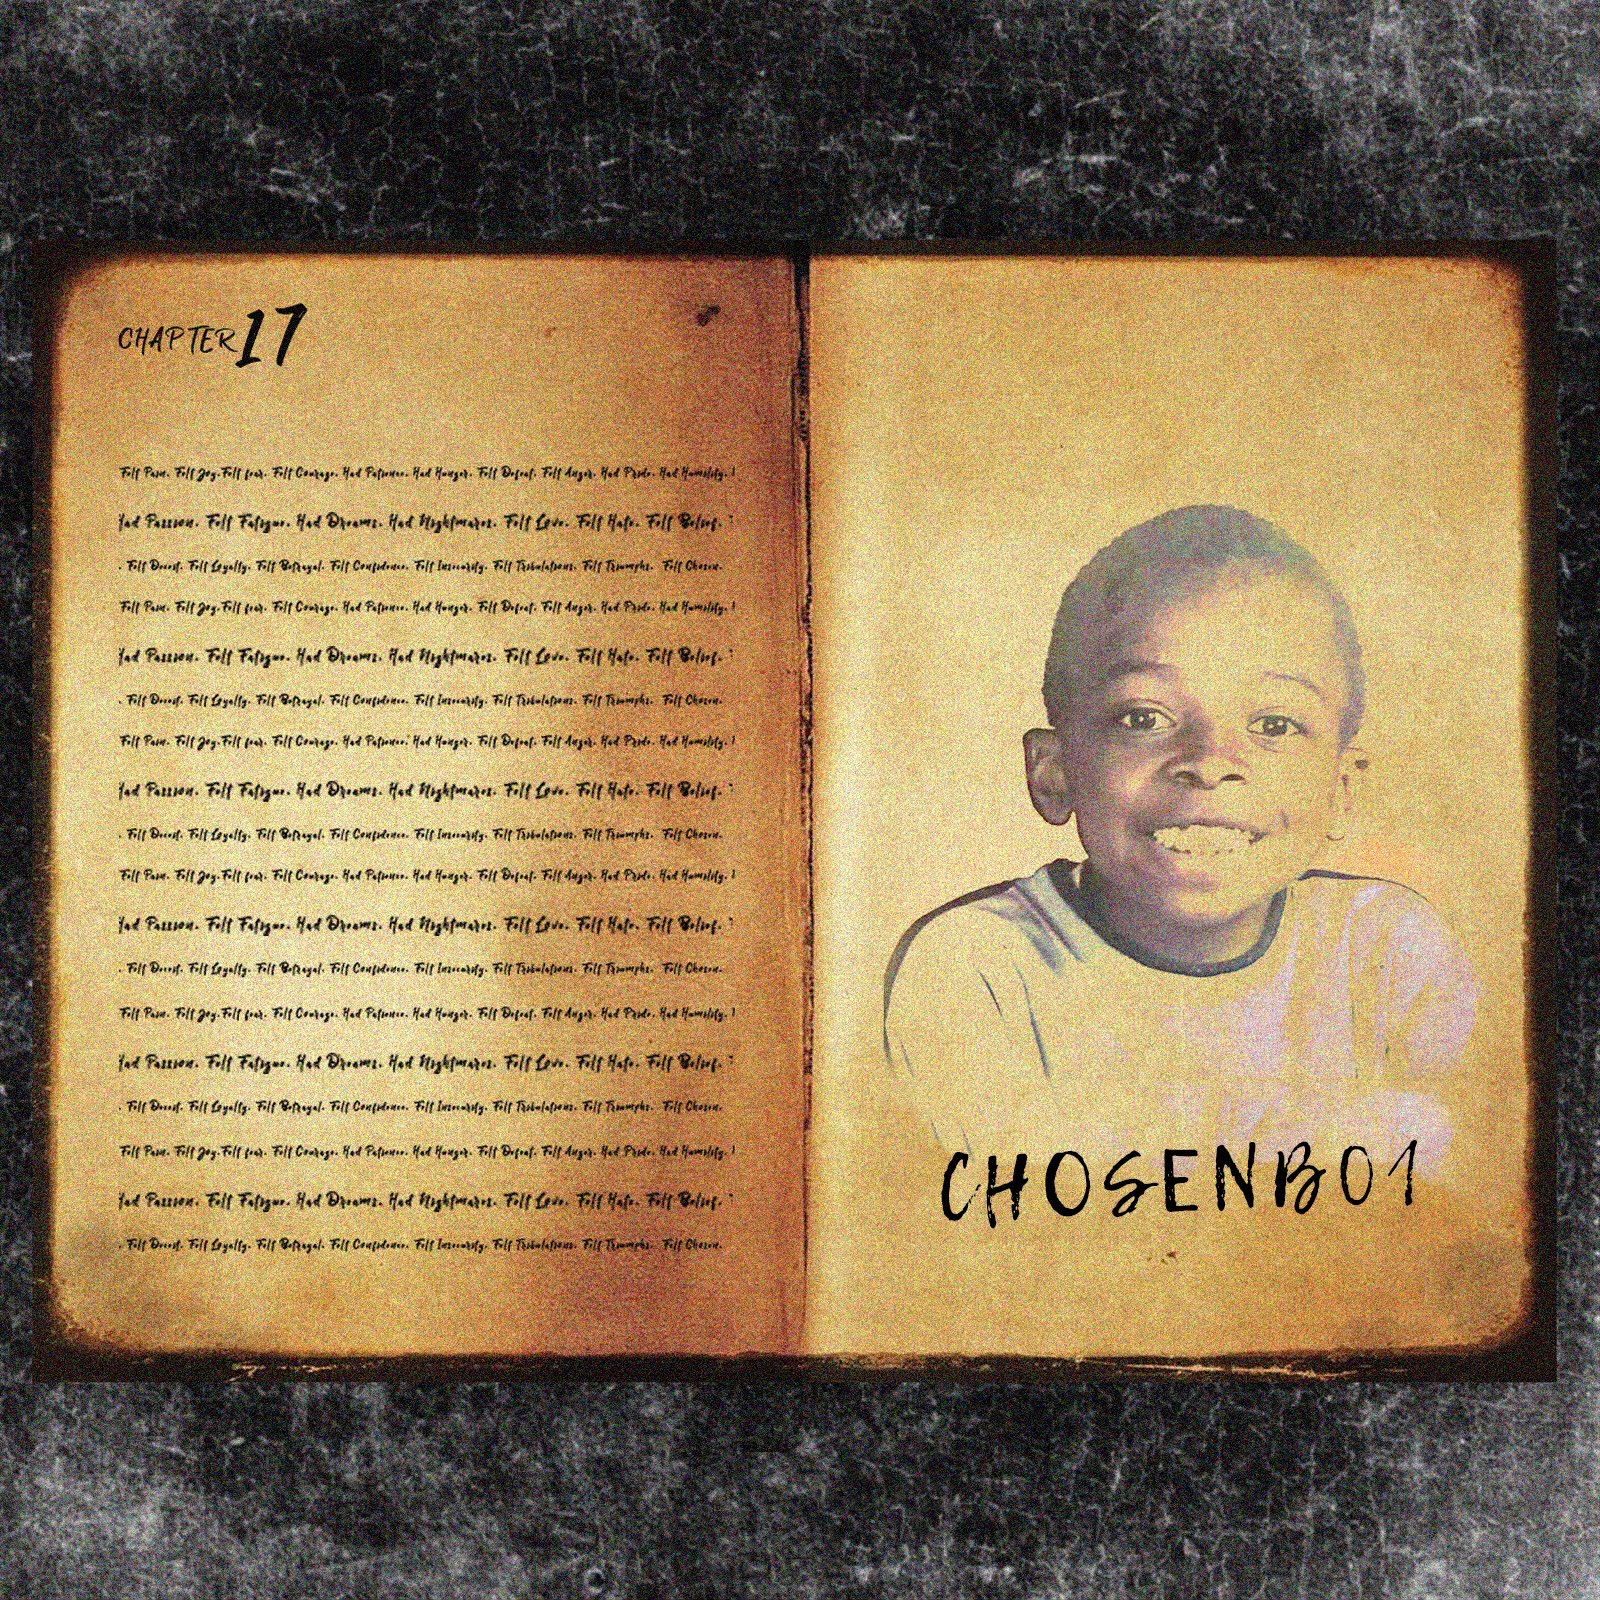 Virginia Tech basketball commit Jonathan Kabongo releases mixtape Chosen B01